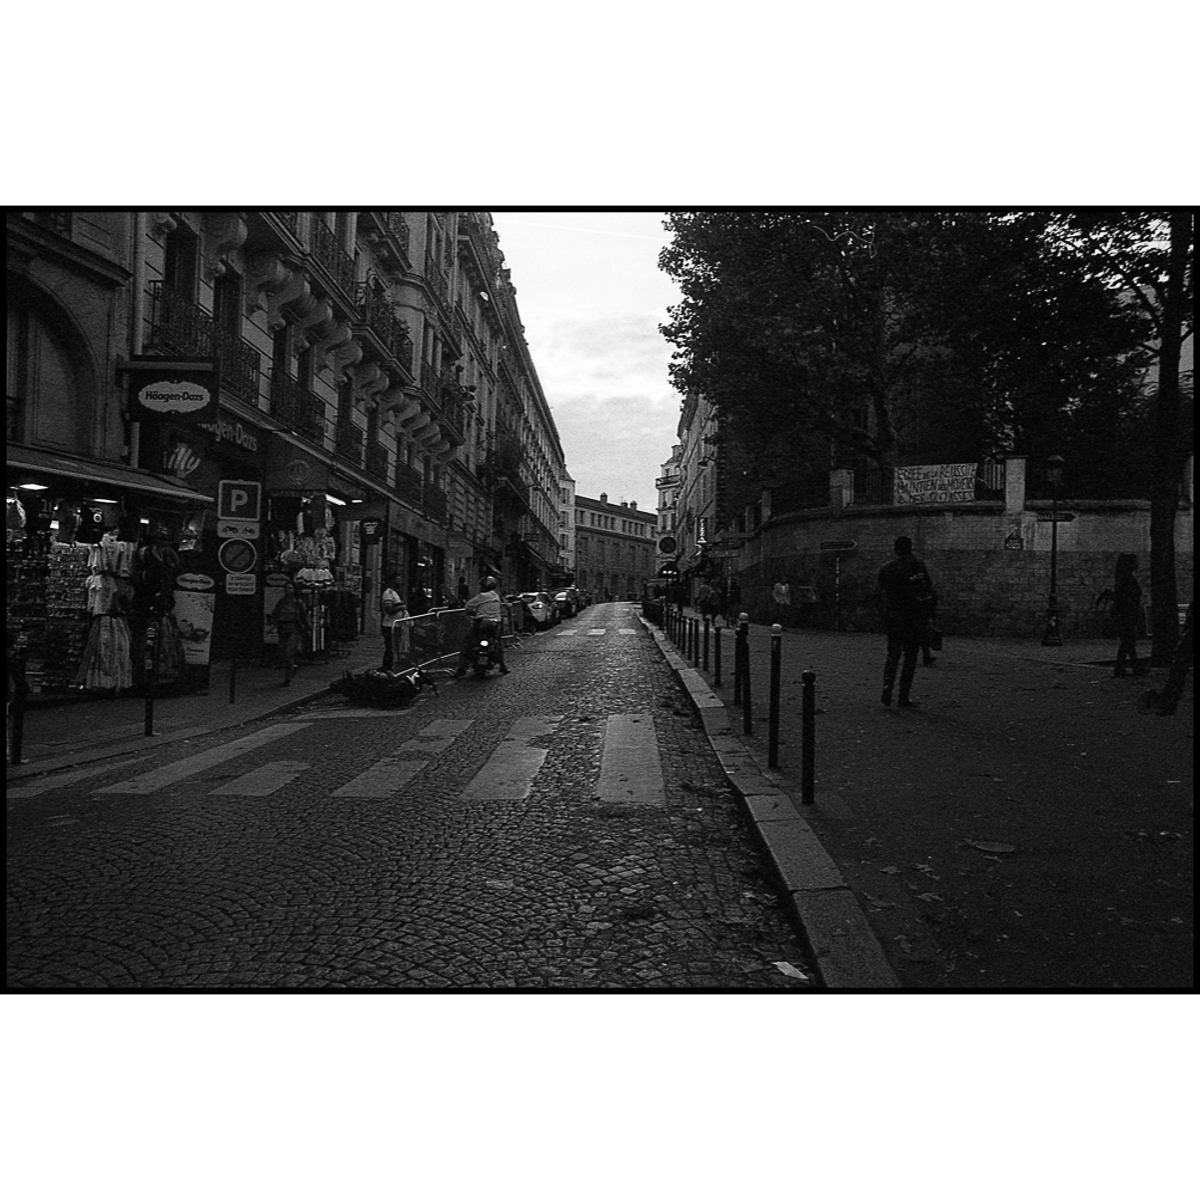 paris file-077.jpg